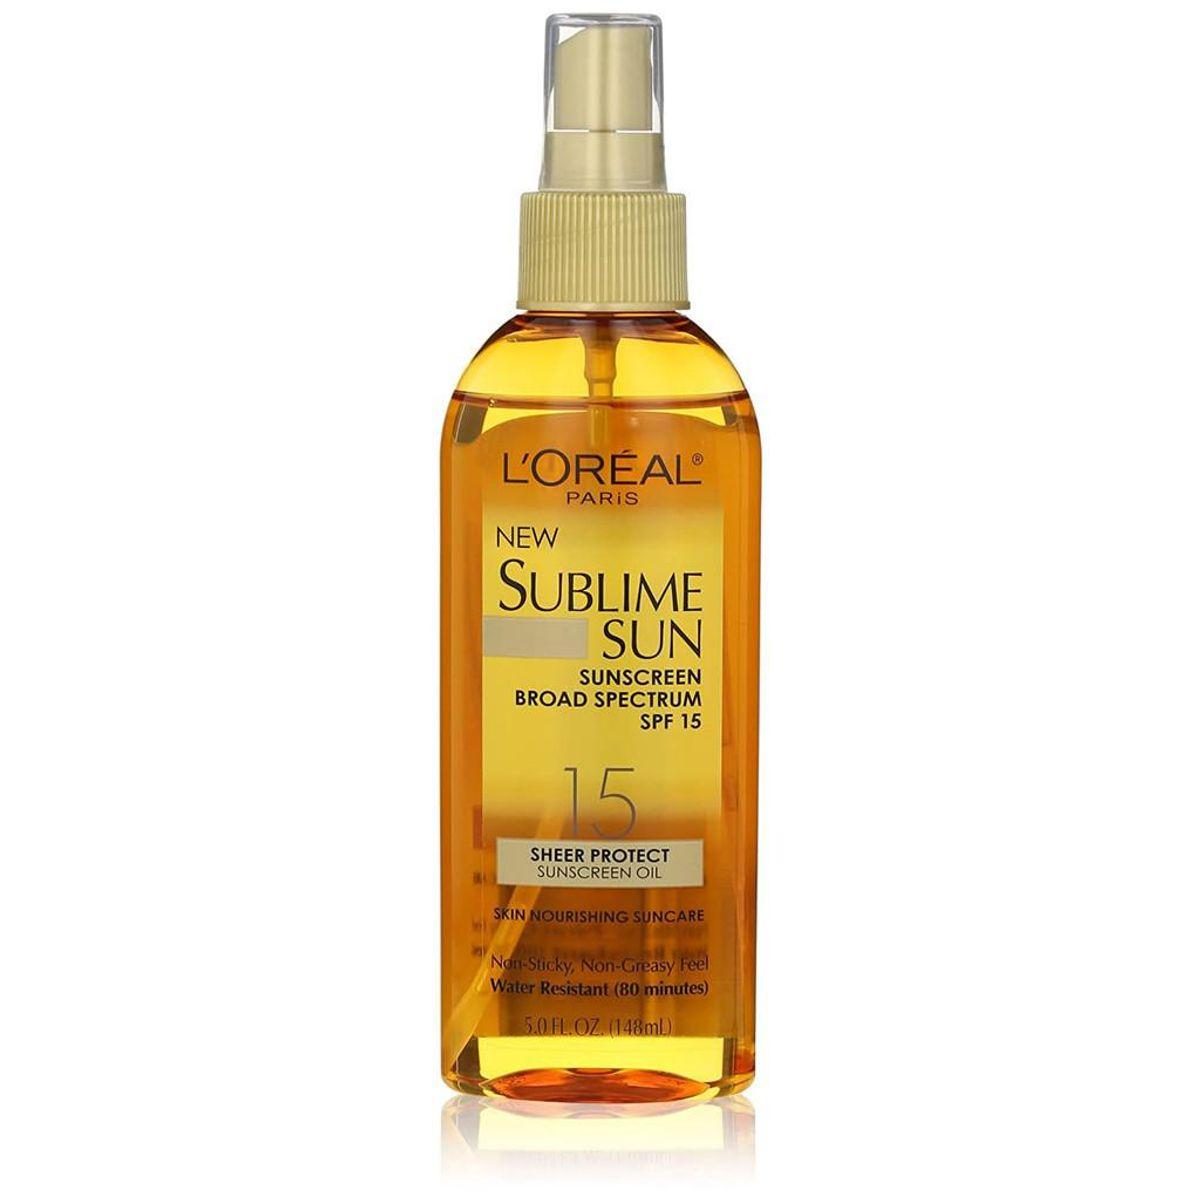 Sublime Sun Advanced Sunscreen Oil Spray SPF 15